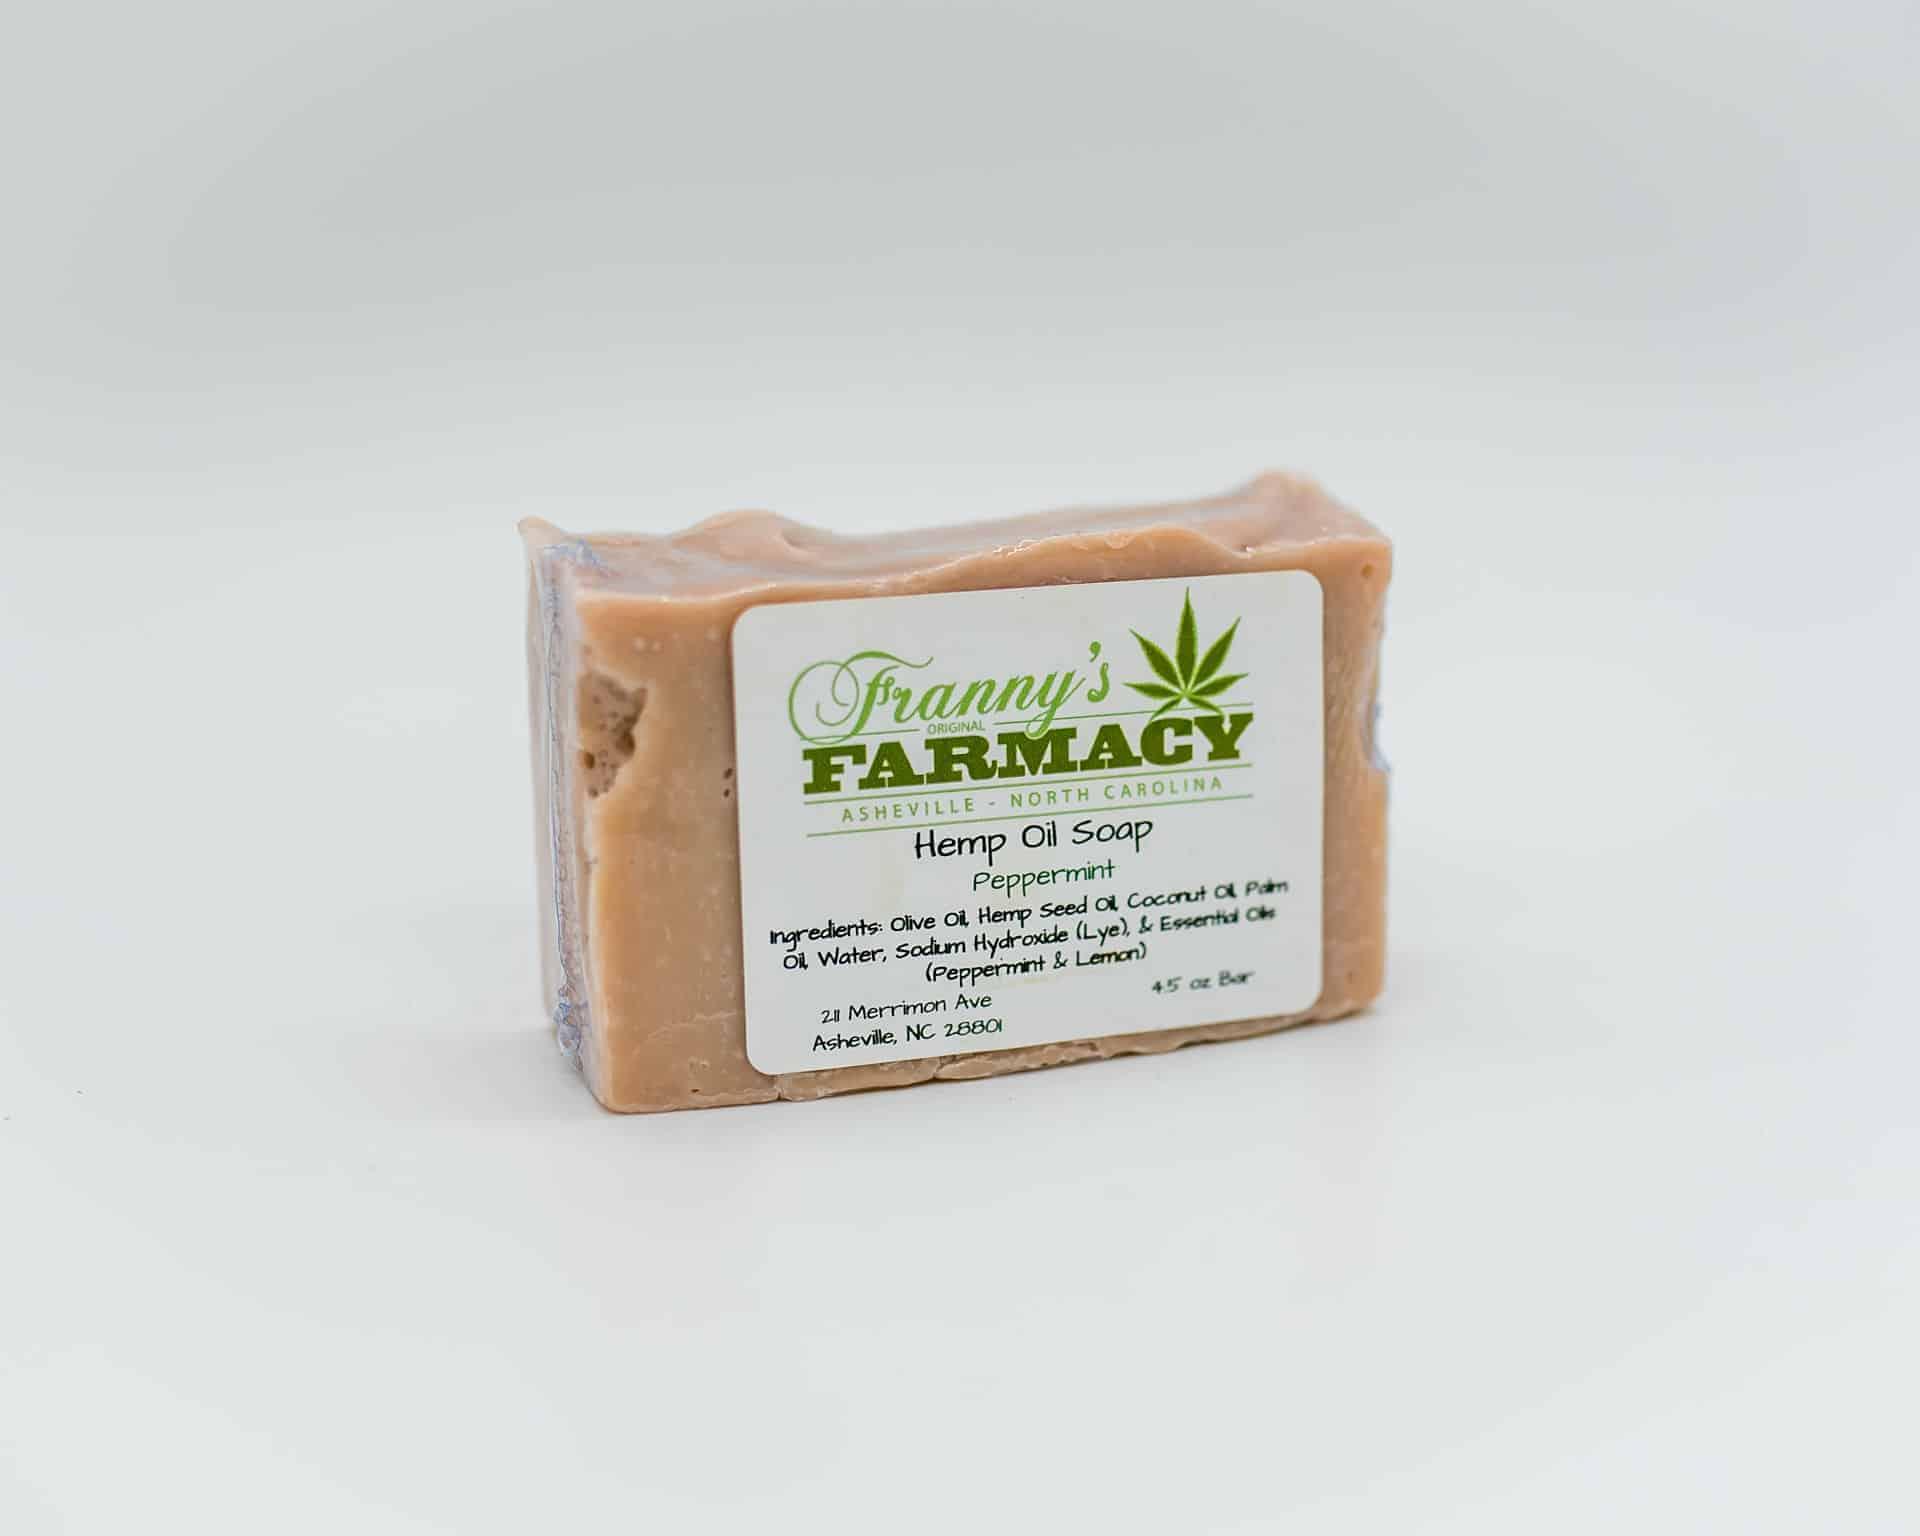 Franny's Farmacy Peppermint Hemp Oil Soap